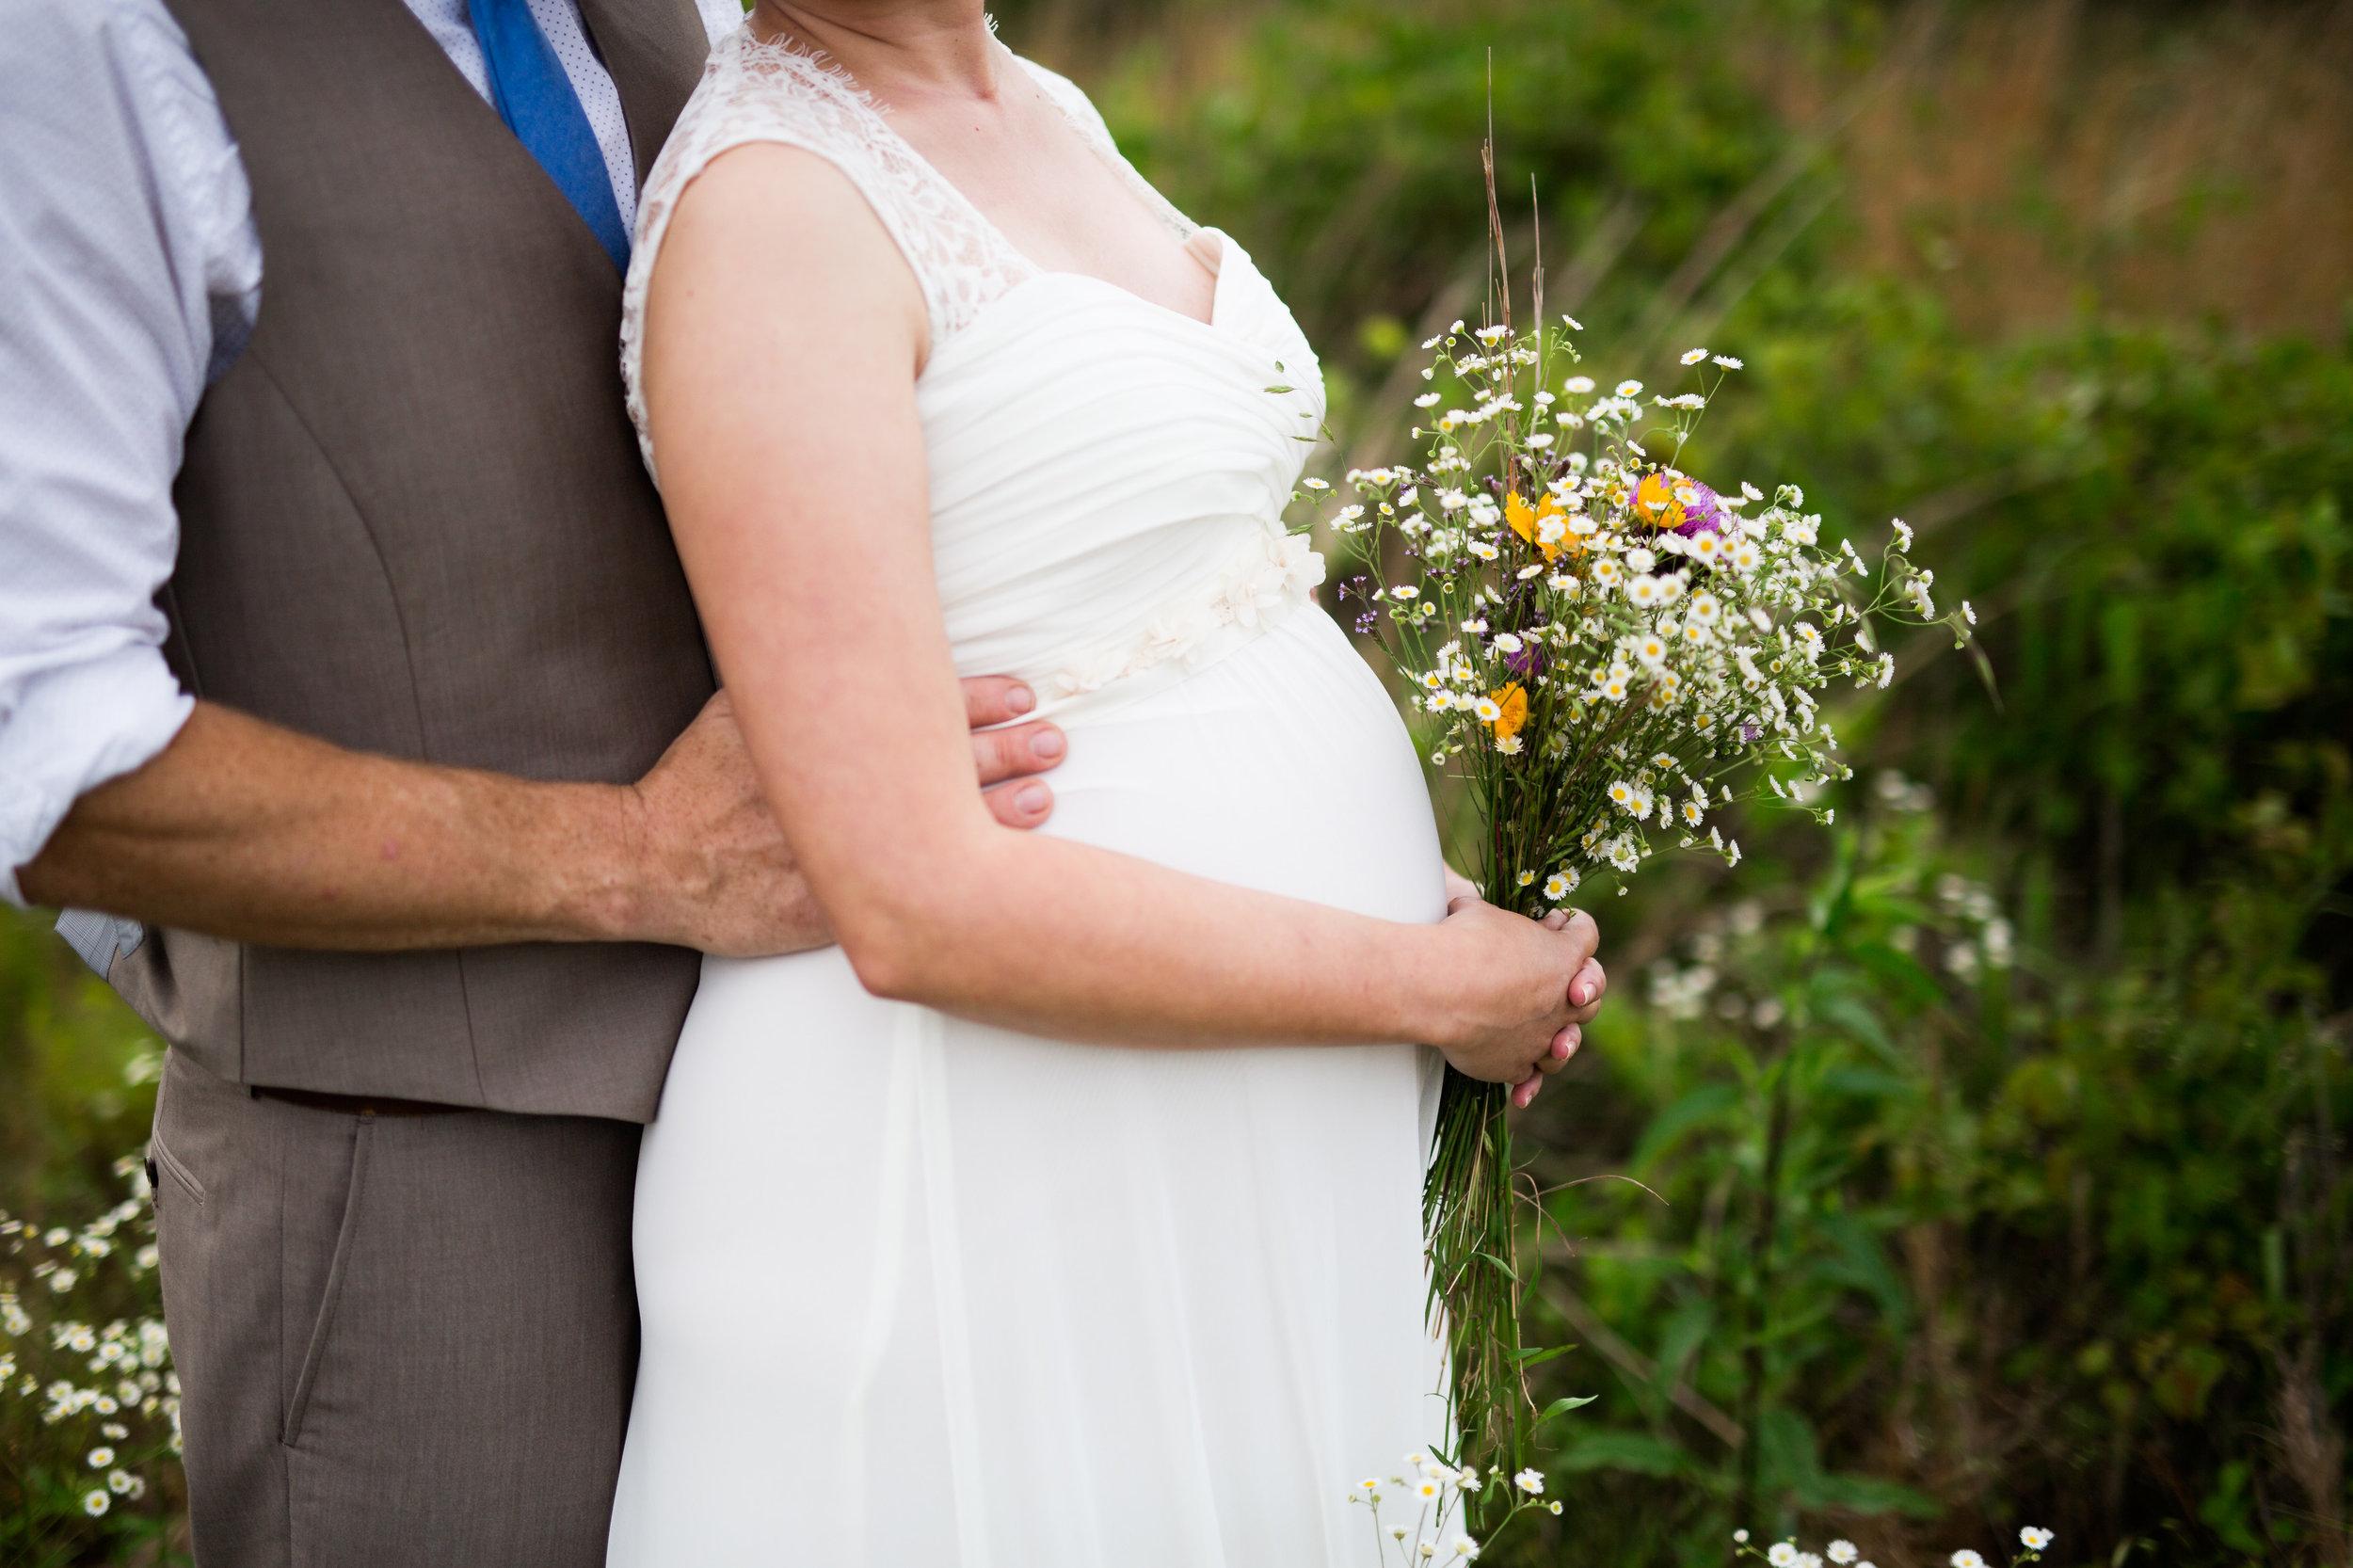 oklahoma wedding southeastern oklahoma saris colors diy nature norman wedding photography beavers bend mccurtain county decor ouachita mountains scenery